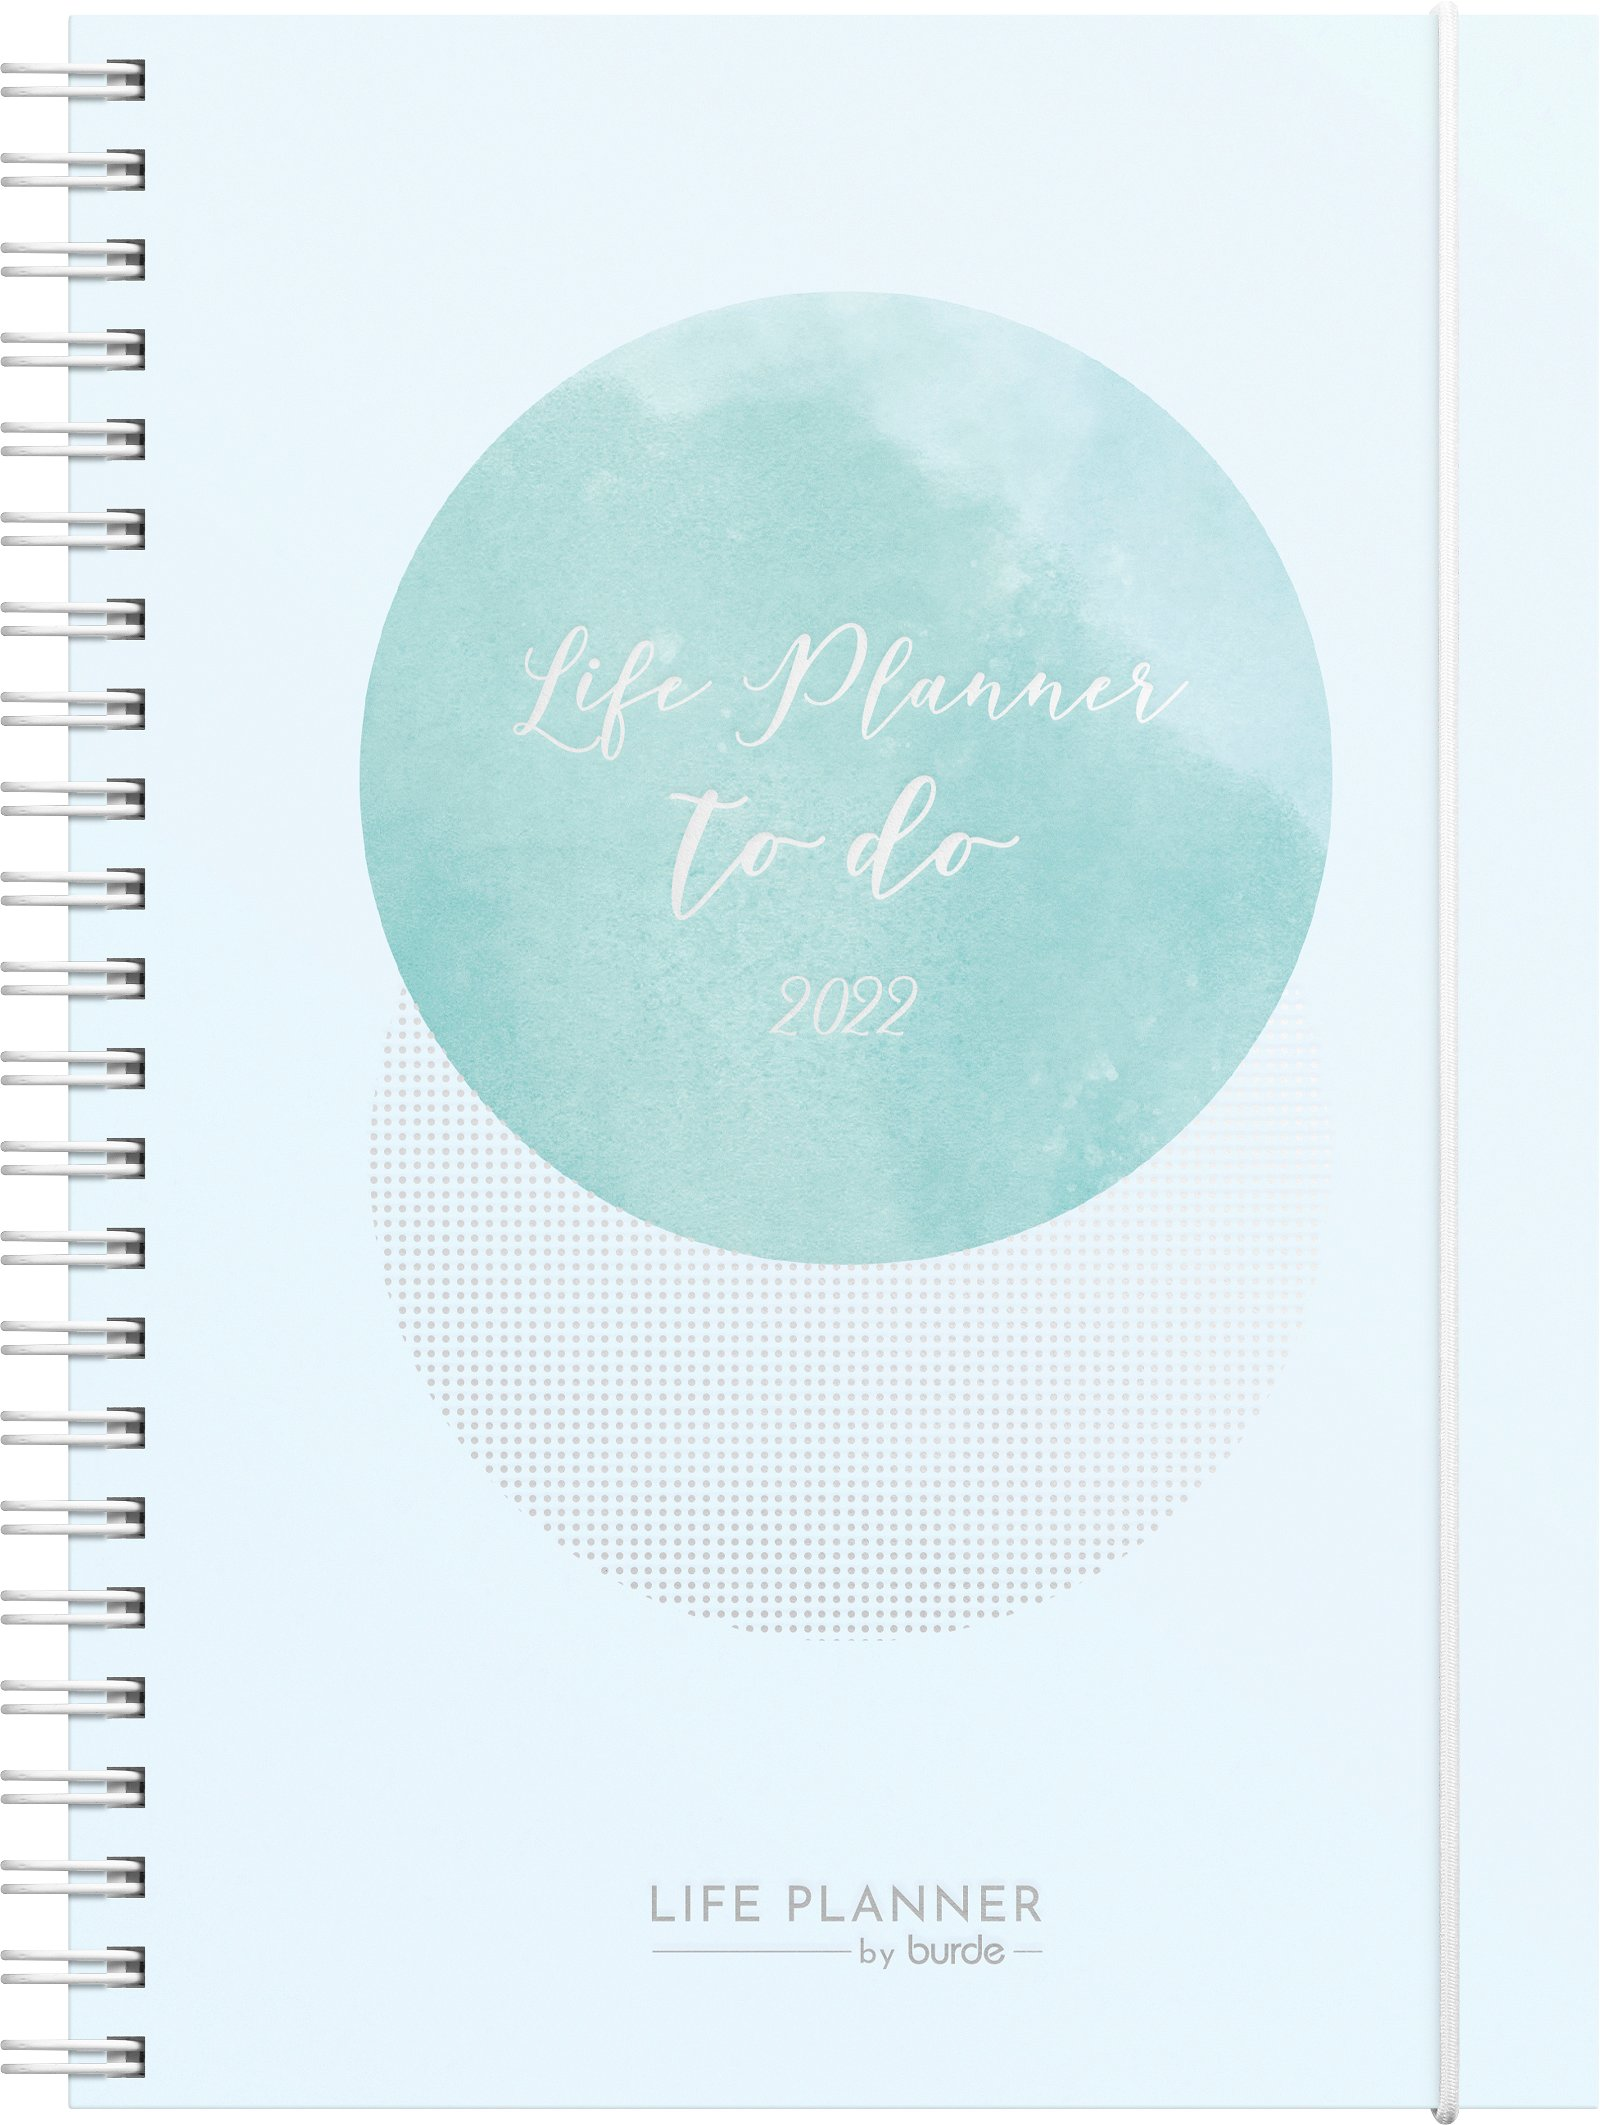 Burde Life Planner Week To Do 2022